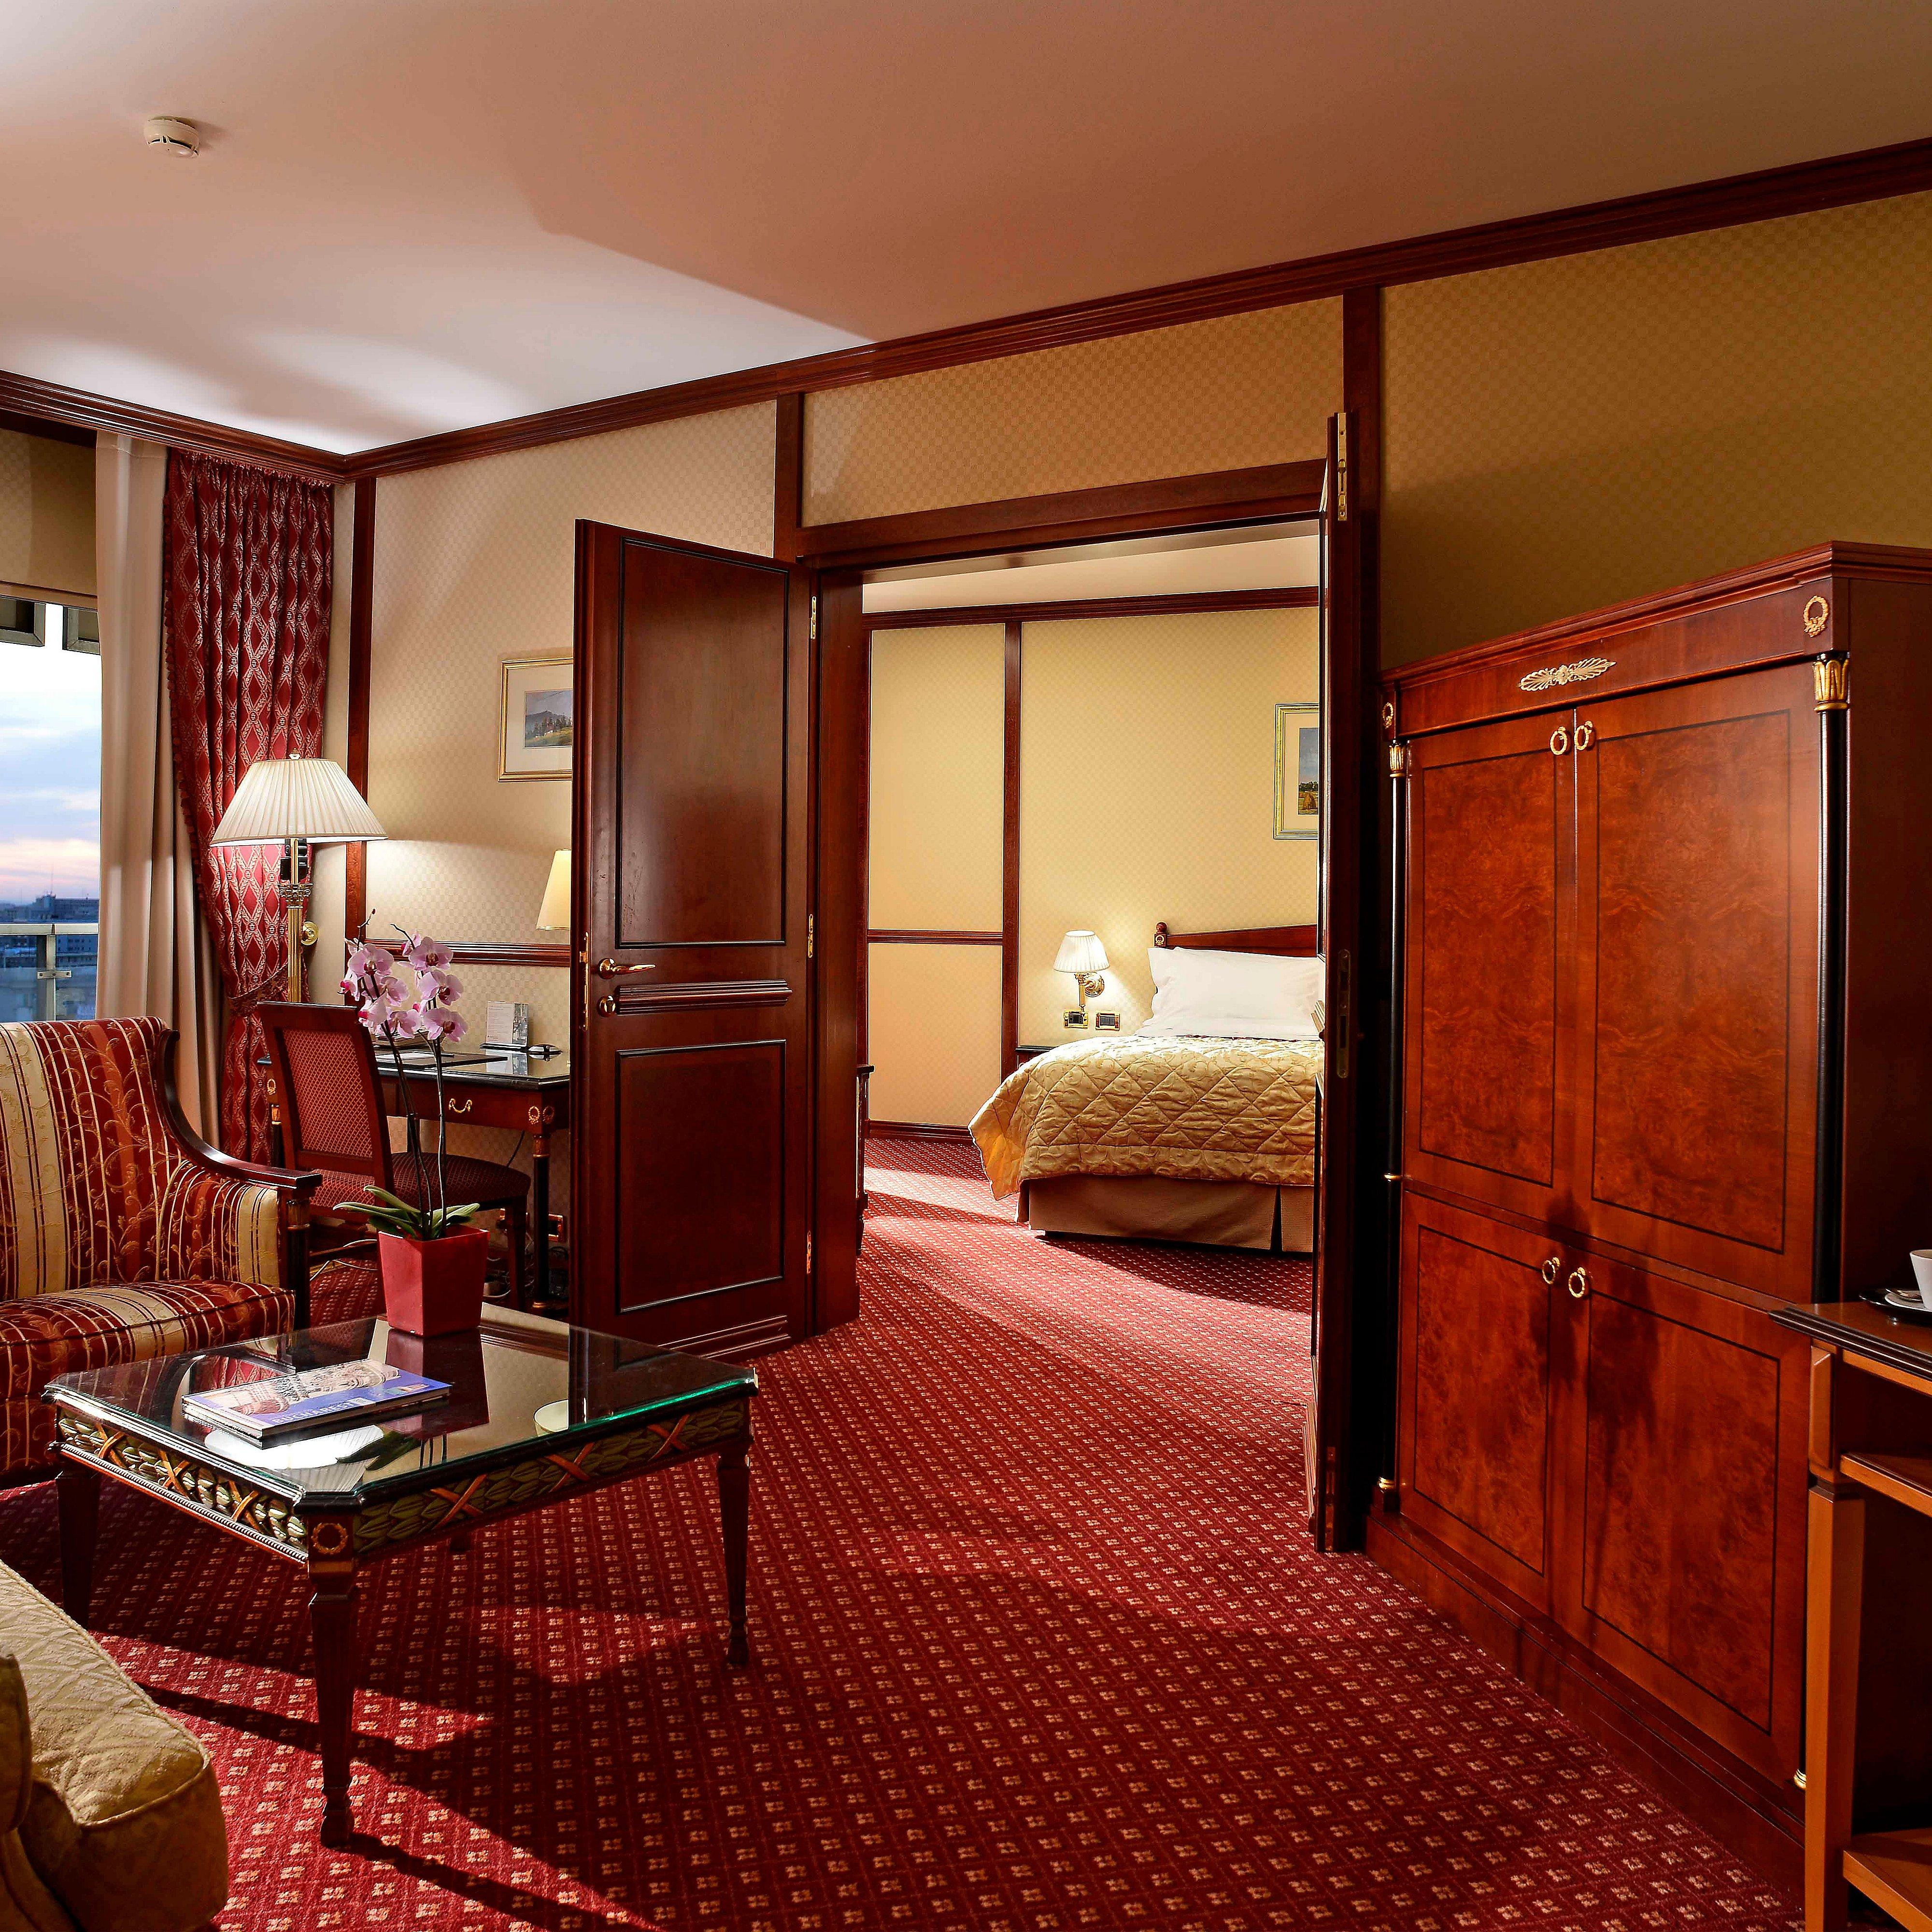 5 Star Hotels Bucharest Intercontinental Bucharest